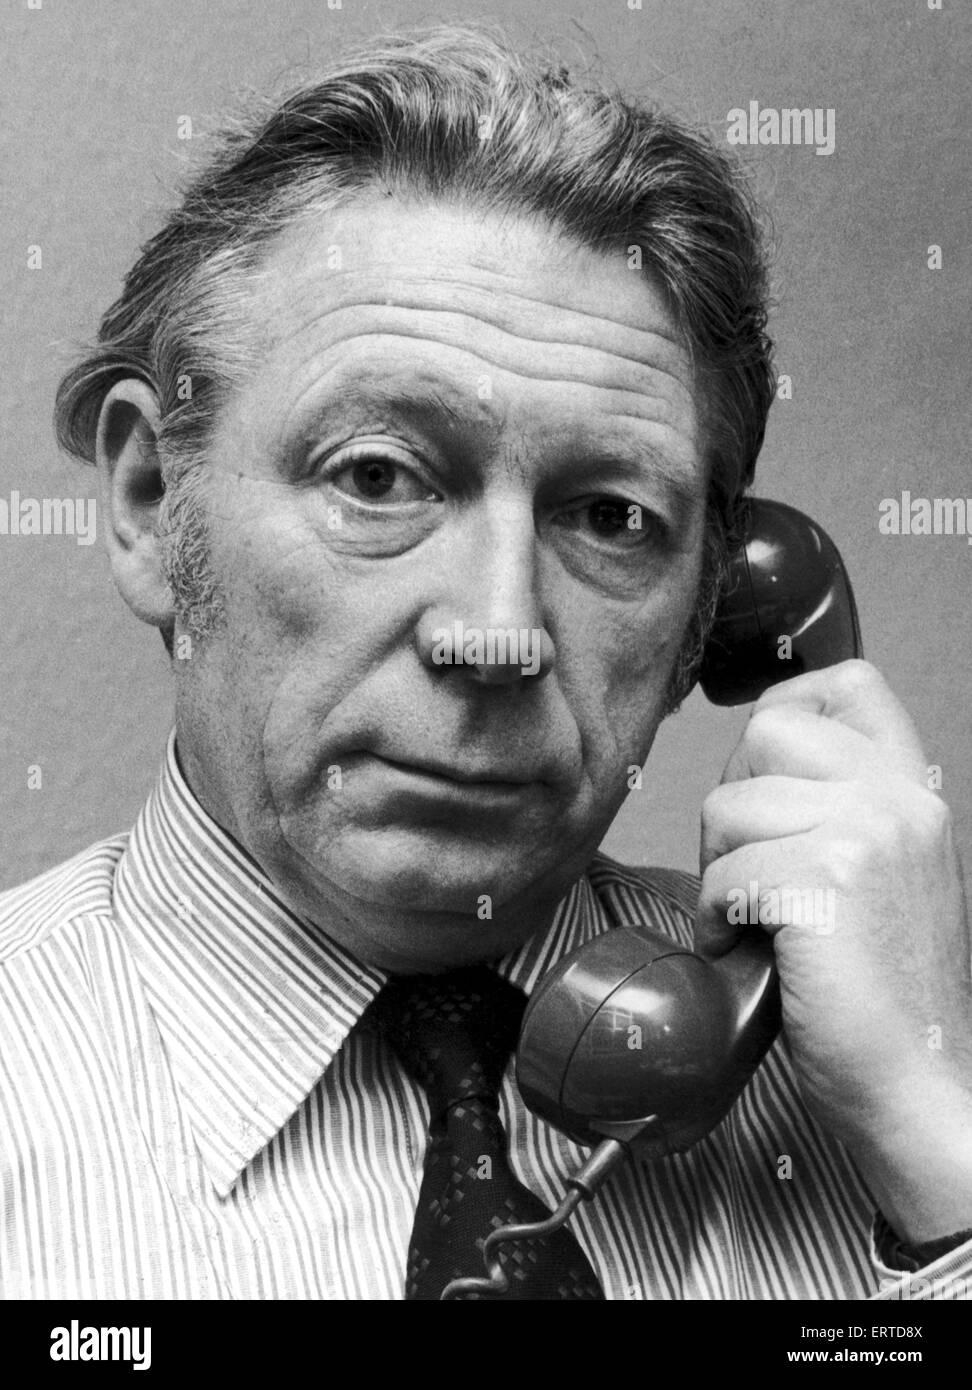 Geoffrey Goodman, Daily Mirror Industrial Correspondant. 30th December 1976 - Stock Image